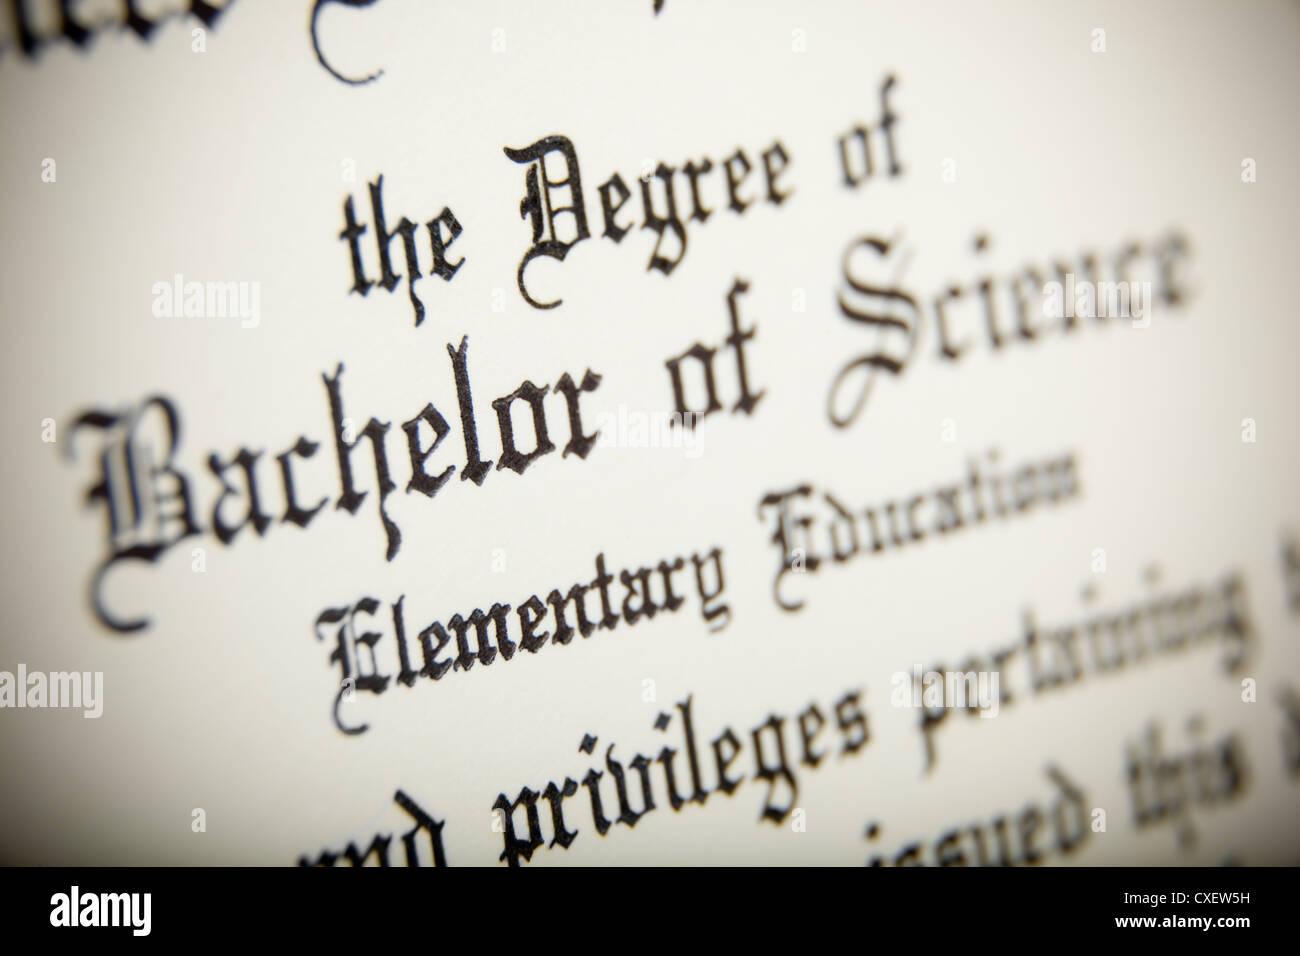 Diploma wording - Stock Image